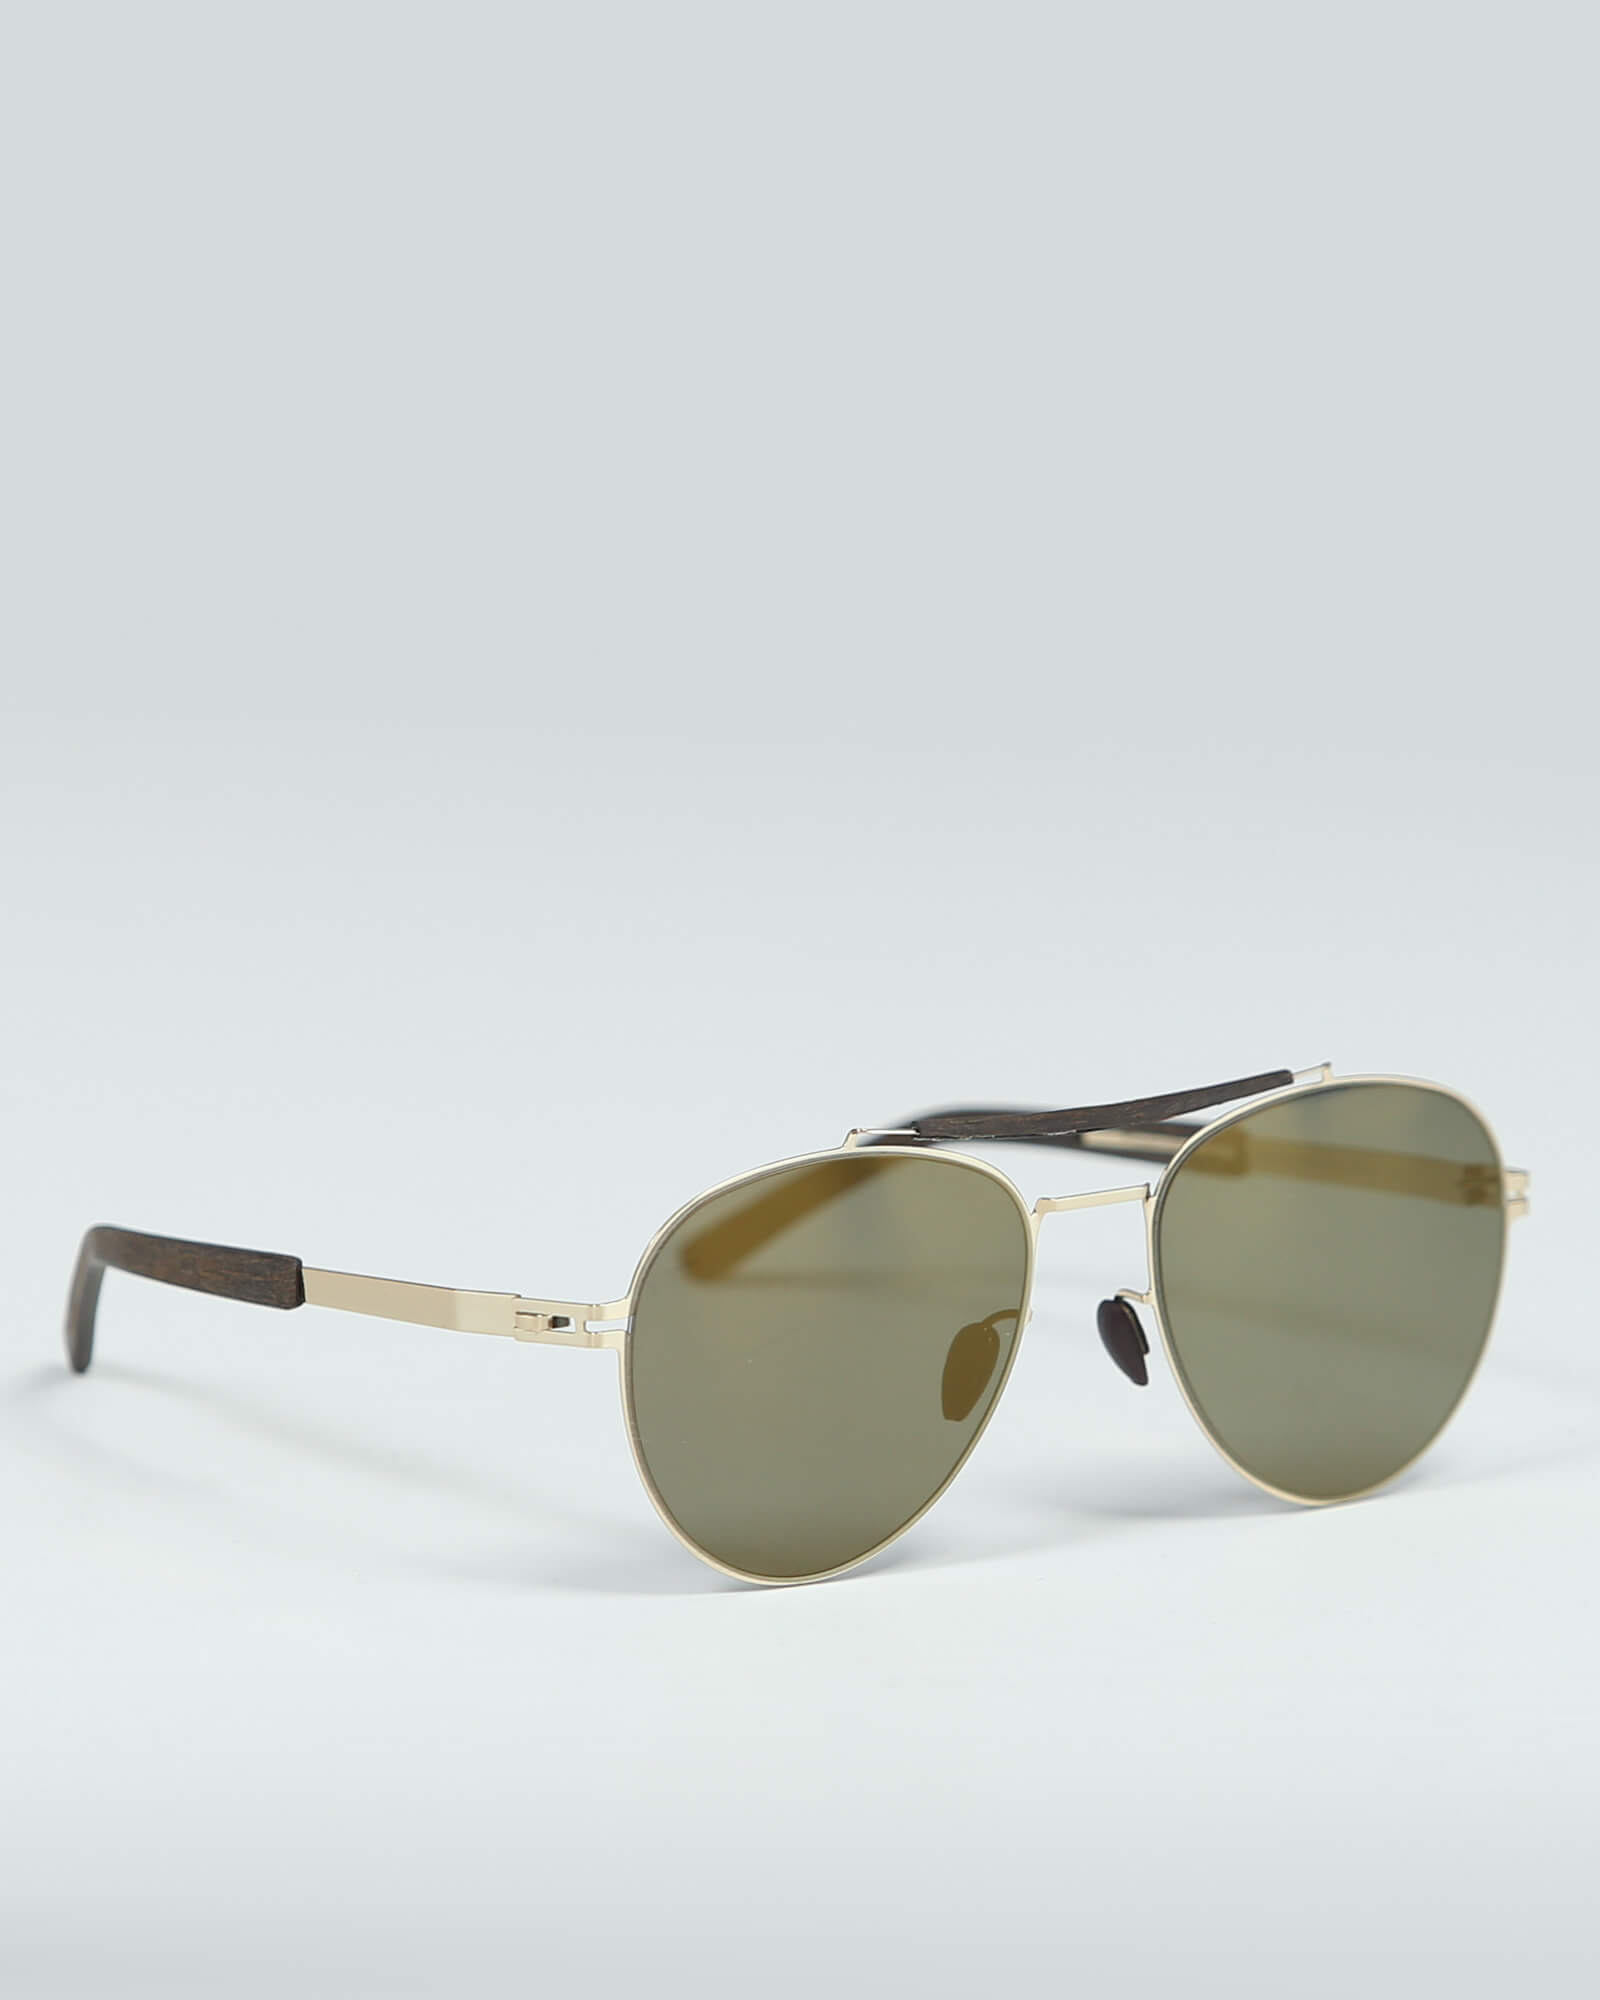 sunglass-2